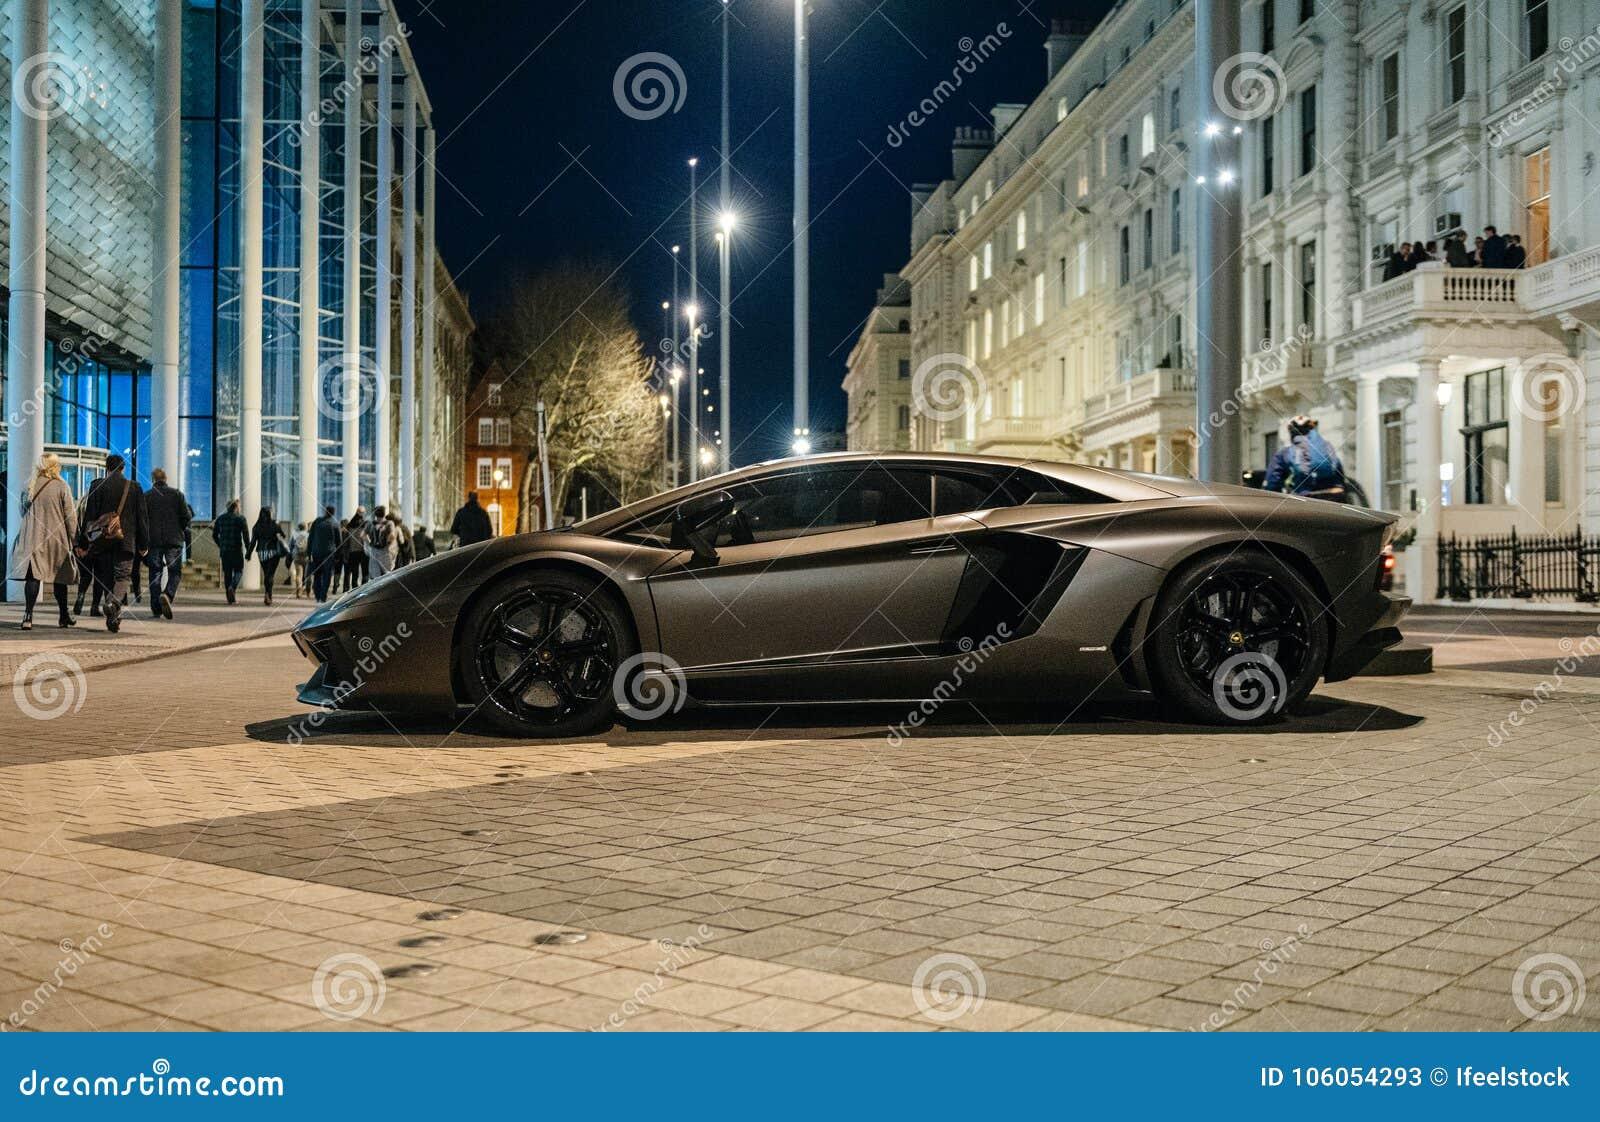 Lamborghini Aventador Luxury Sport Carbon Car Parked On Kensignton